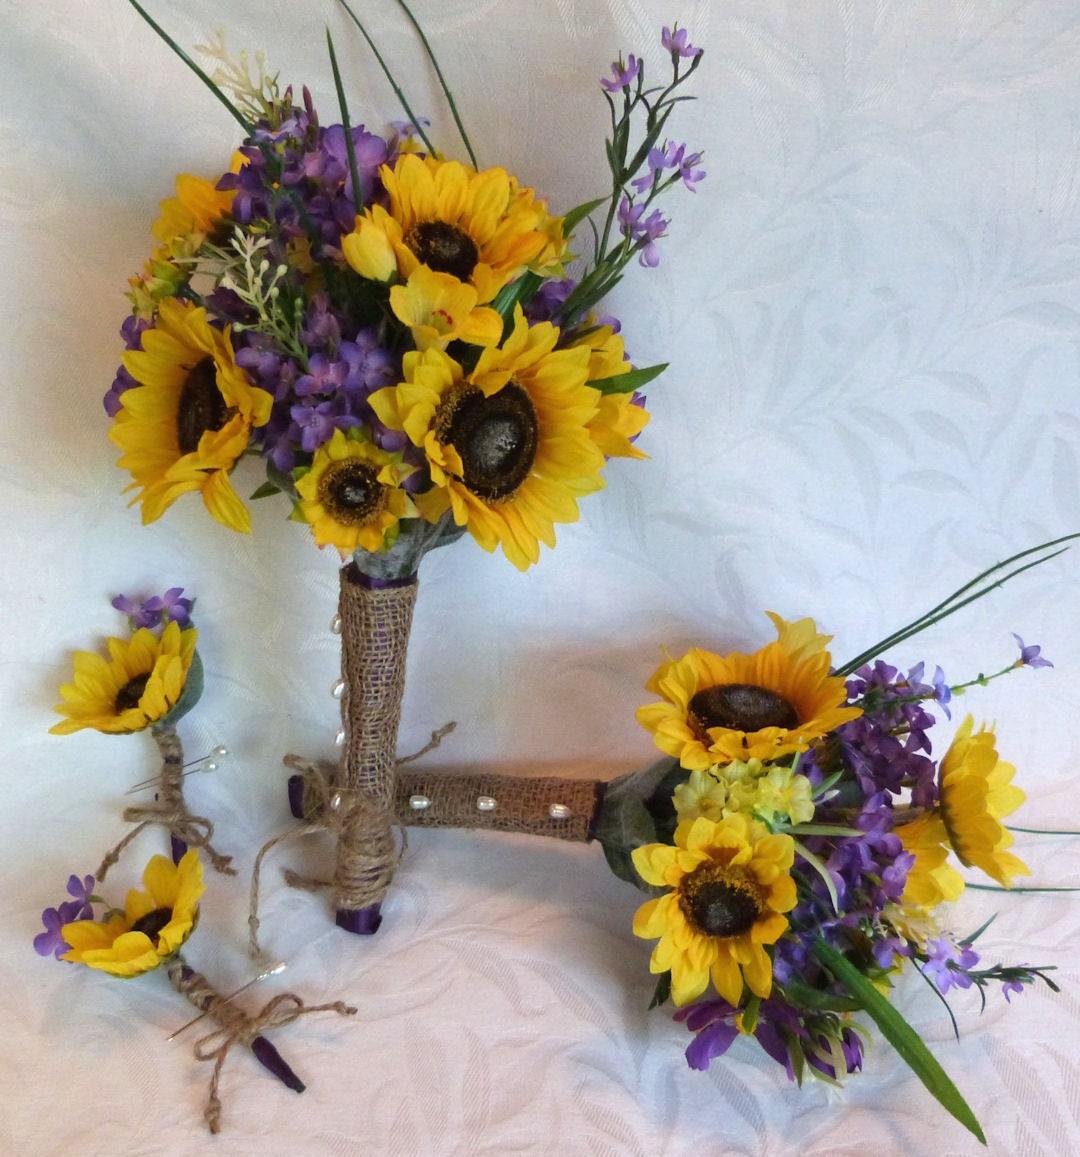 Sunflower Wedding Bouquet Ideas: Sunflower Wedding Country Wedding 4 Piece Sunflower Bouquet